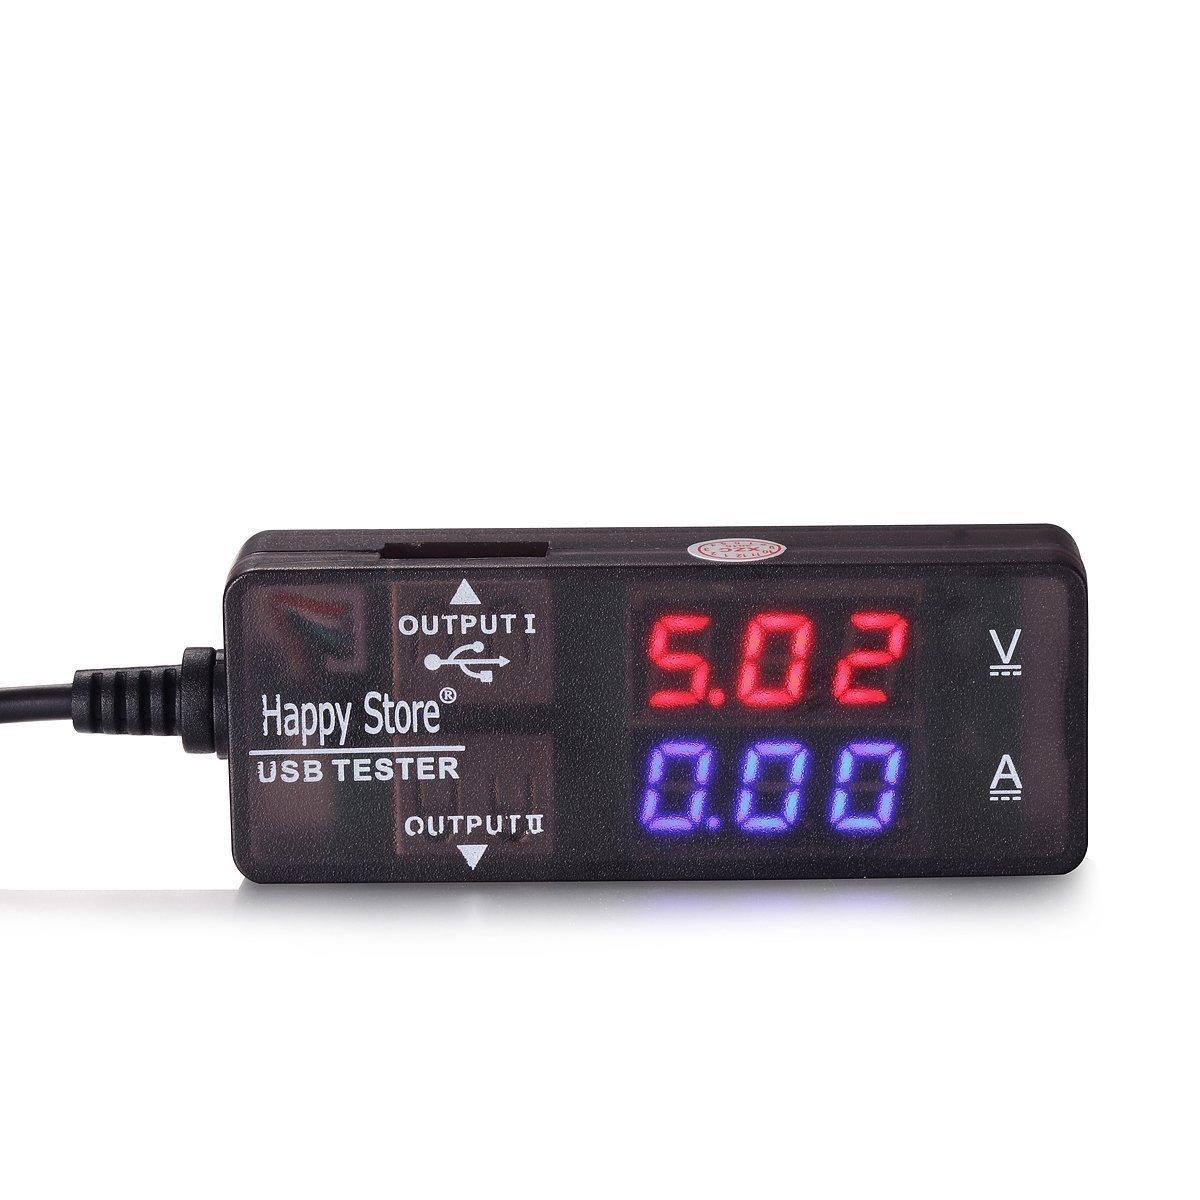 USB 2.0 Digital Multimeter,Ammeter Voltmeter Capacity Power Meter Tester by GTT